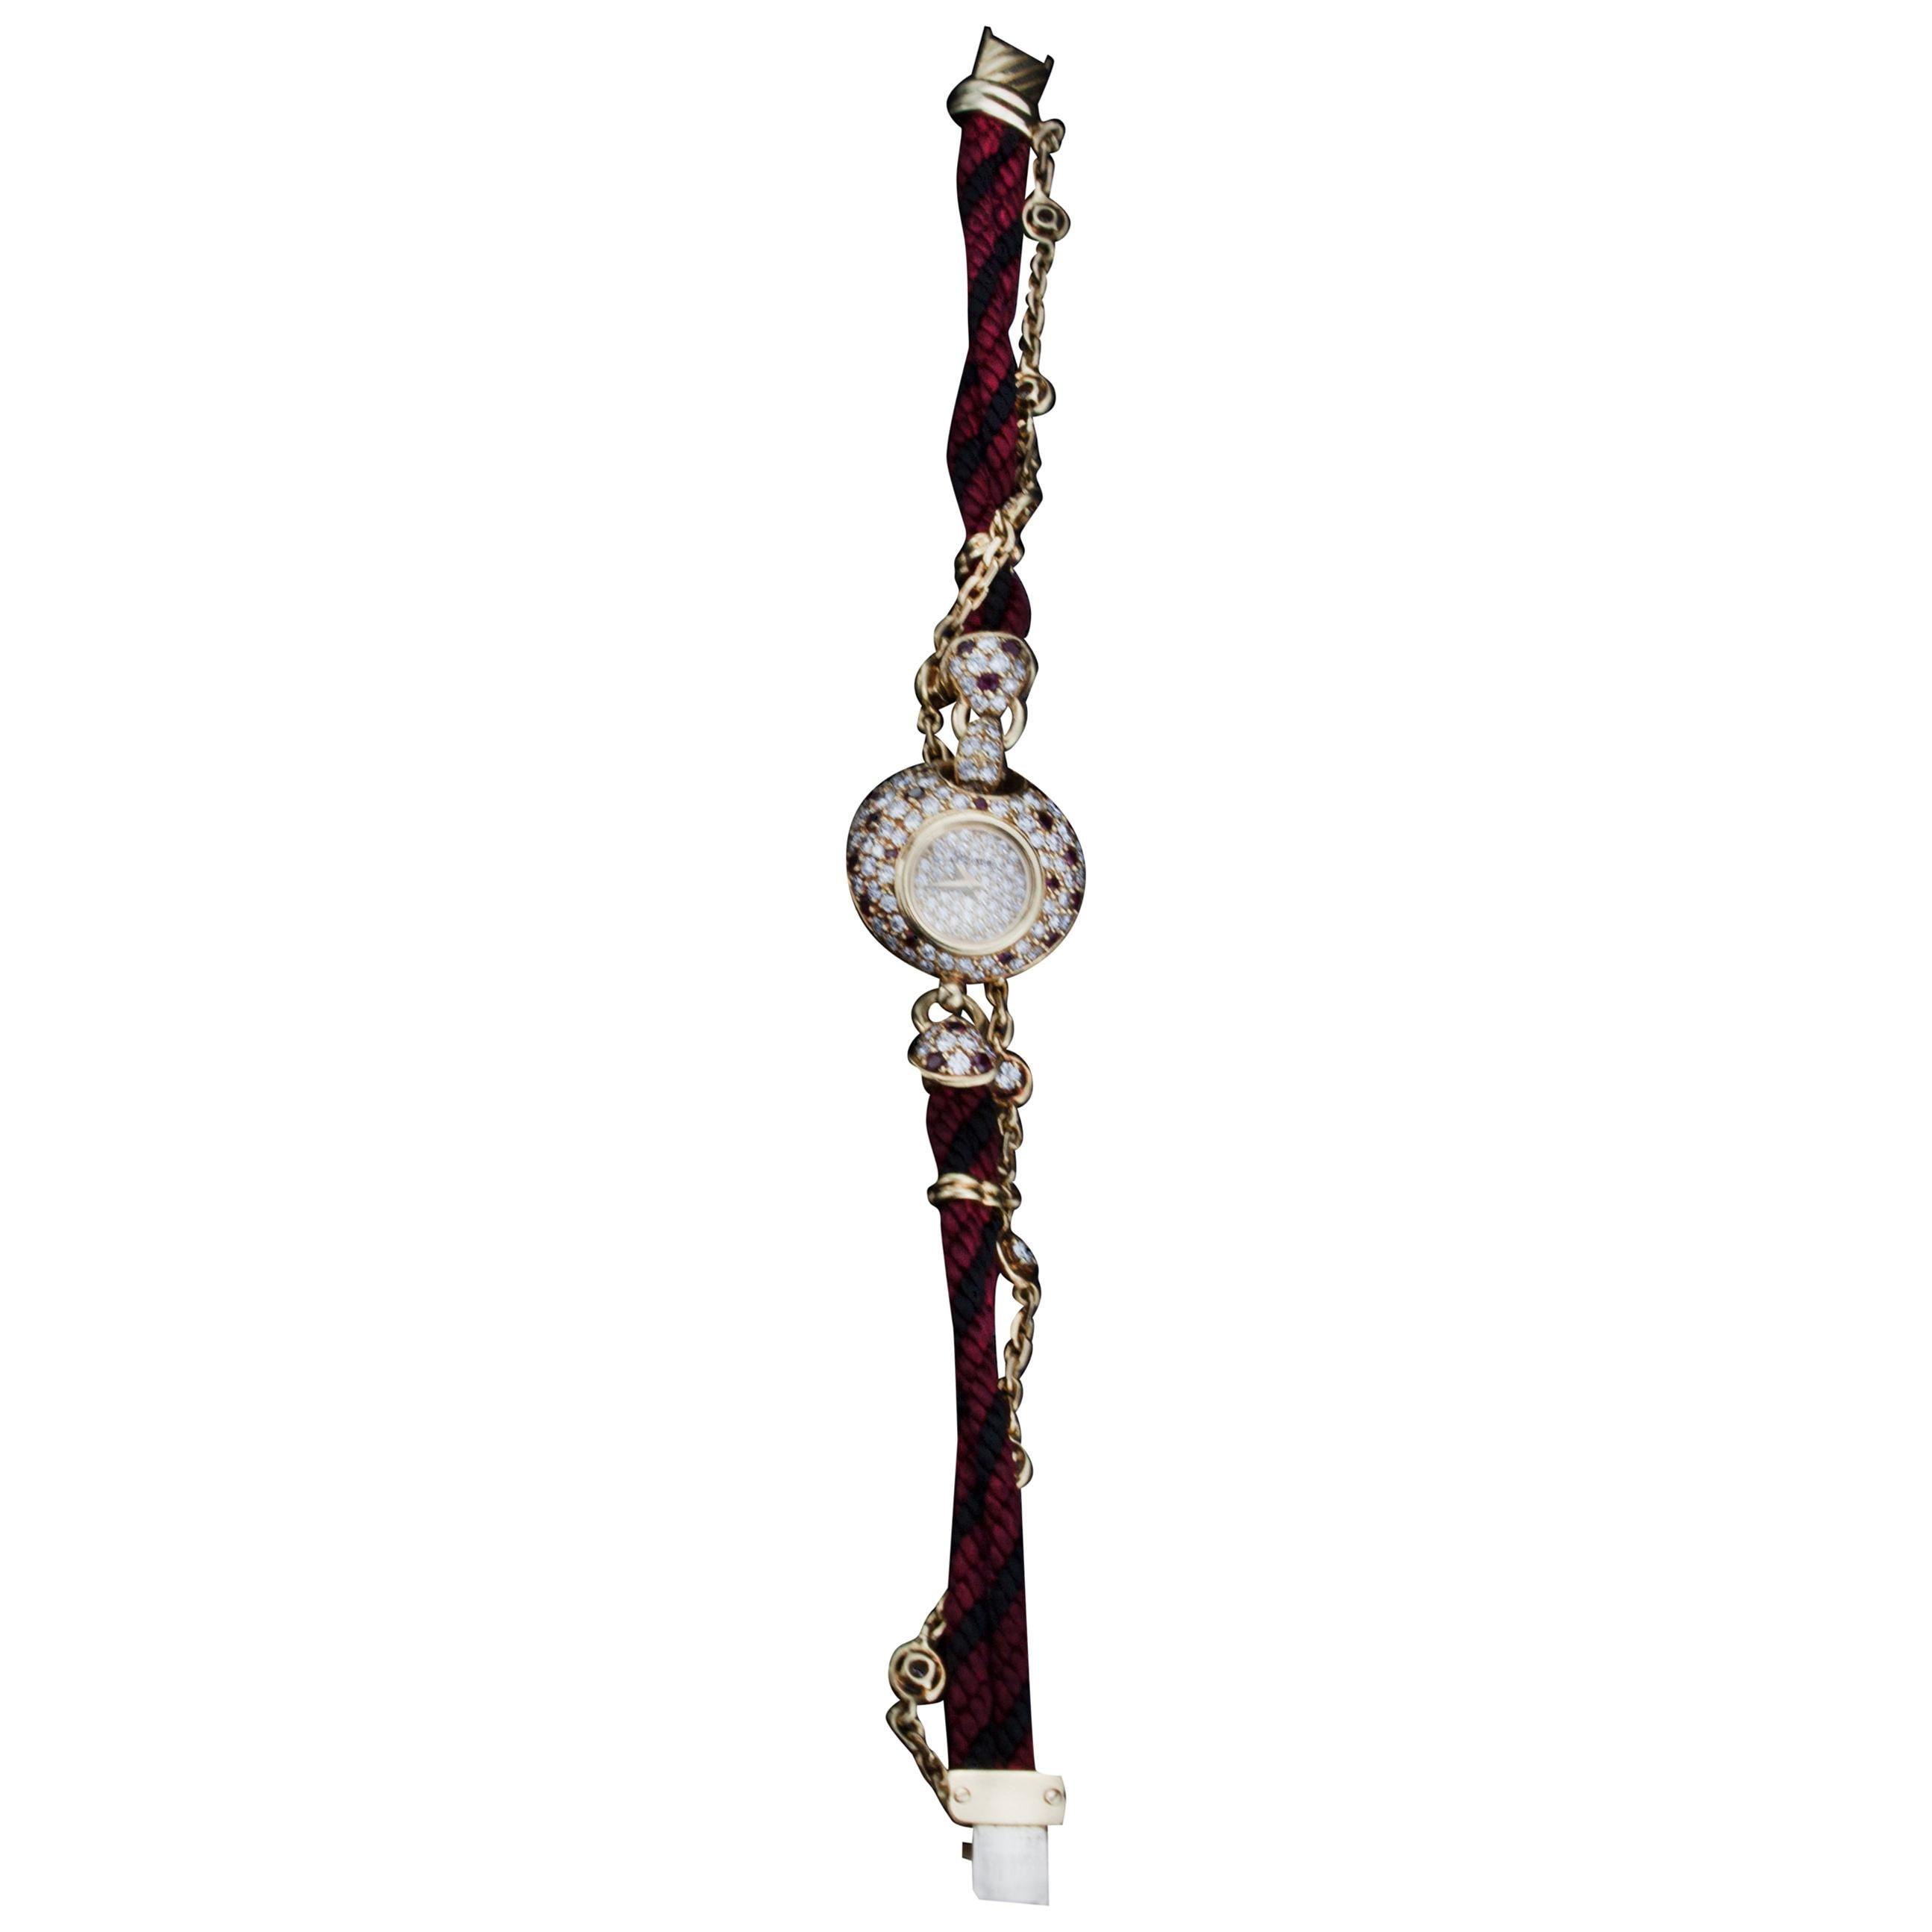 Dalaneau 18 Karat Gold Ladies Bracelet Watch with Diamonds and Rubies, 1980s